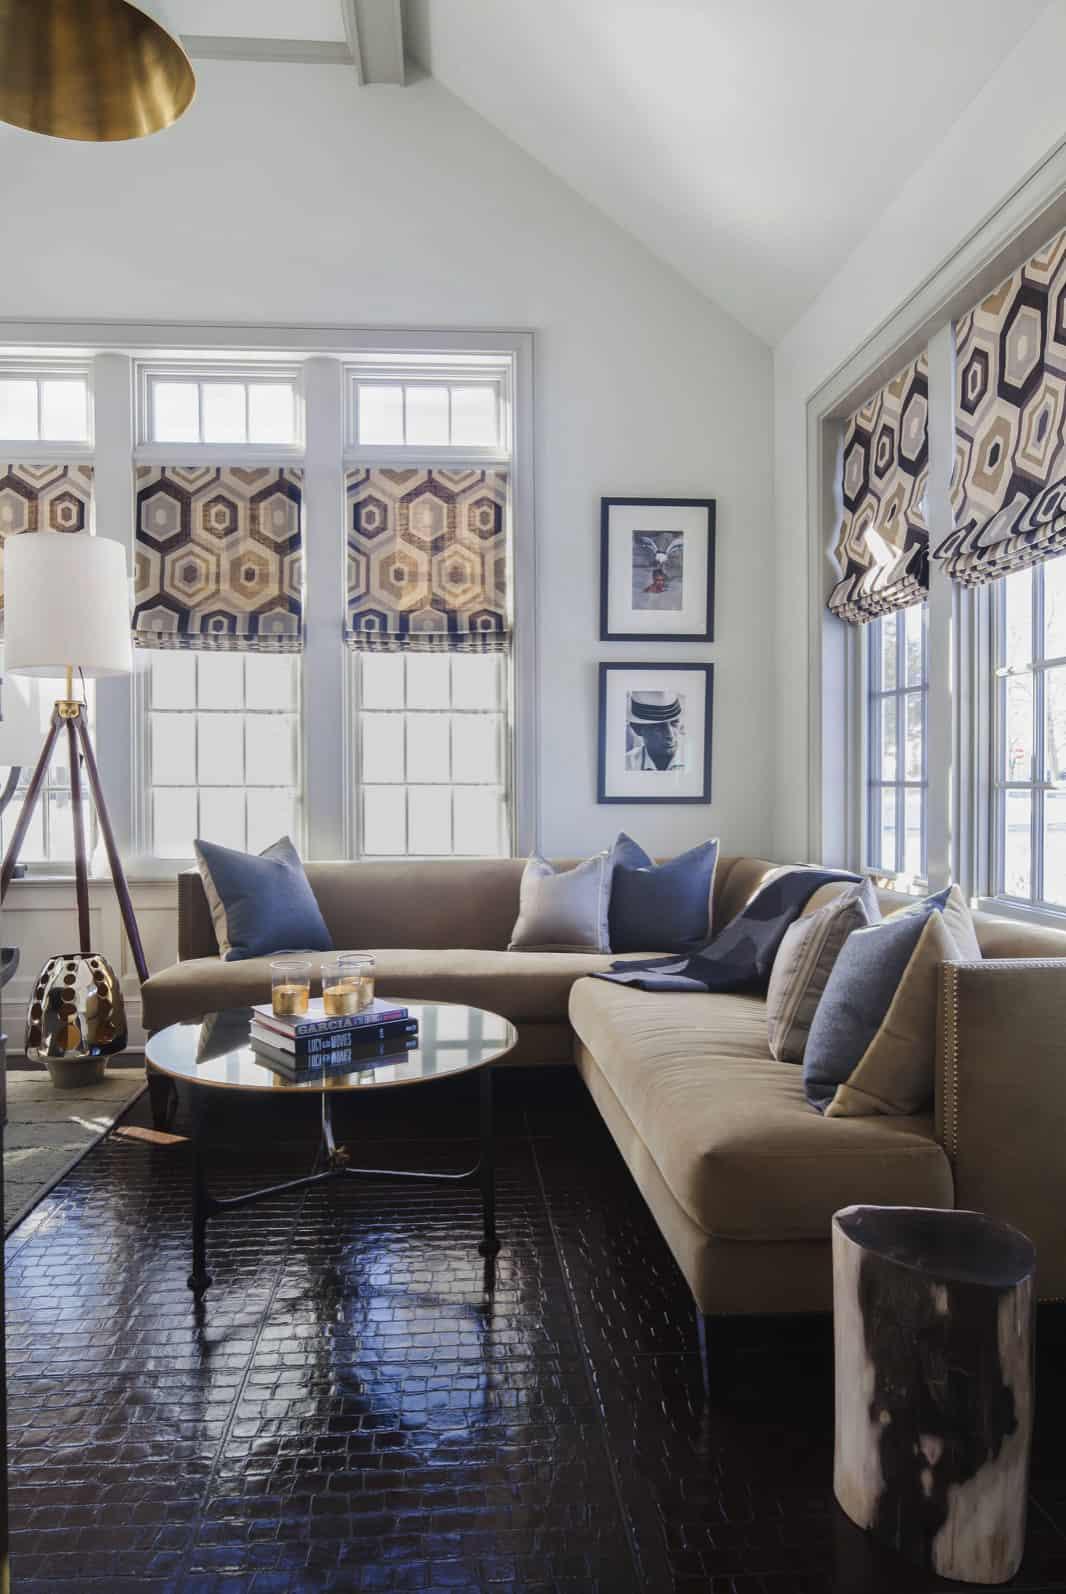 modern-sitting-room-in-brown-and-beige-tones